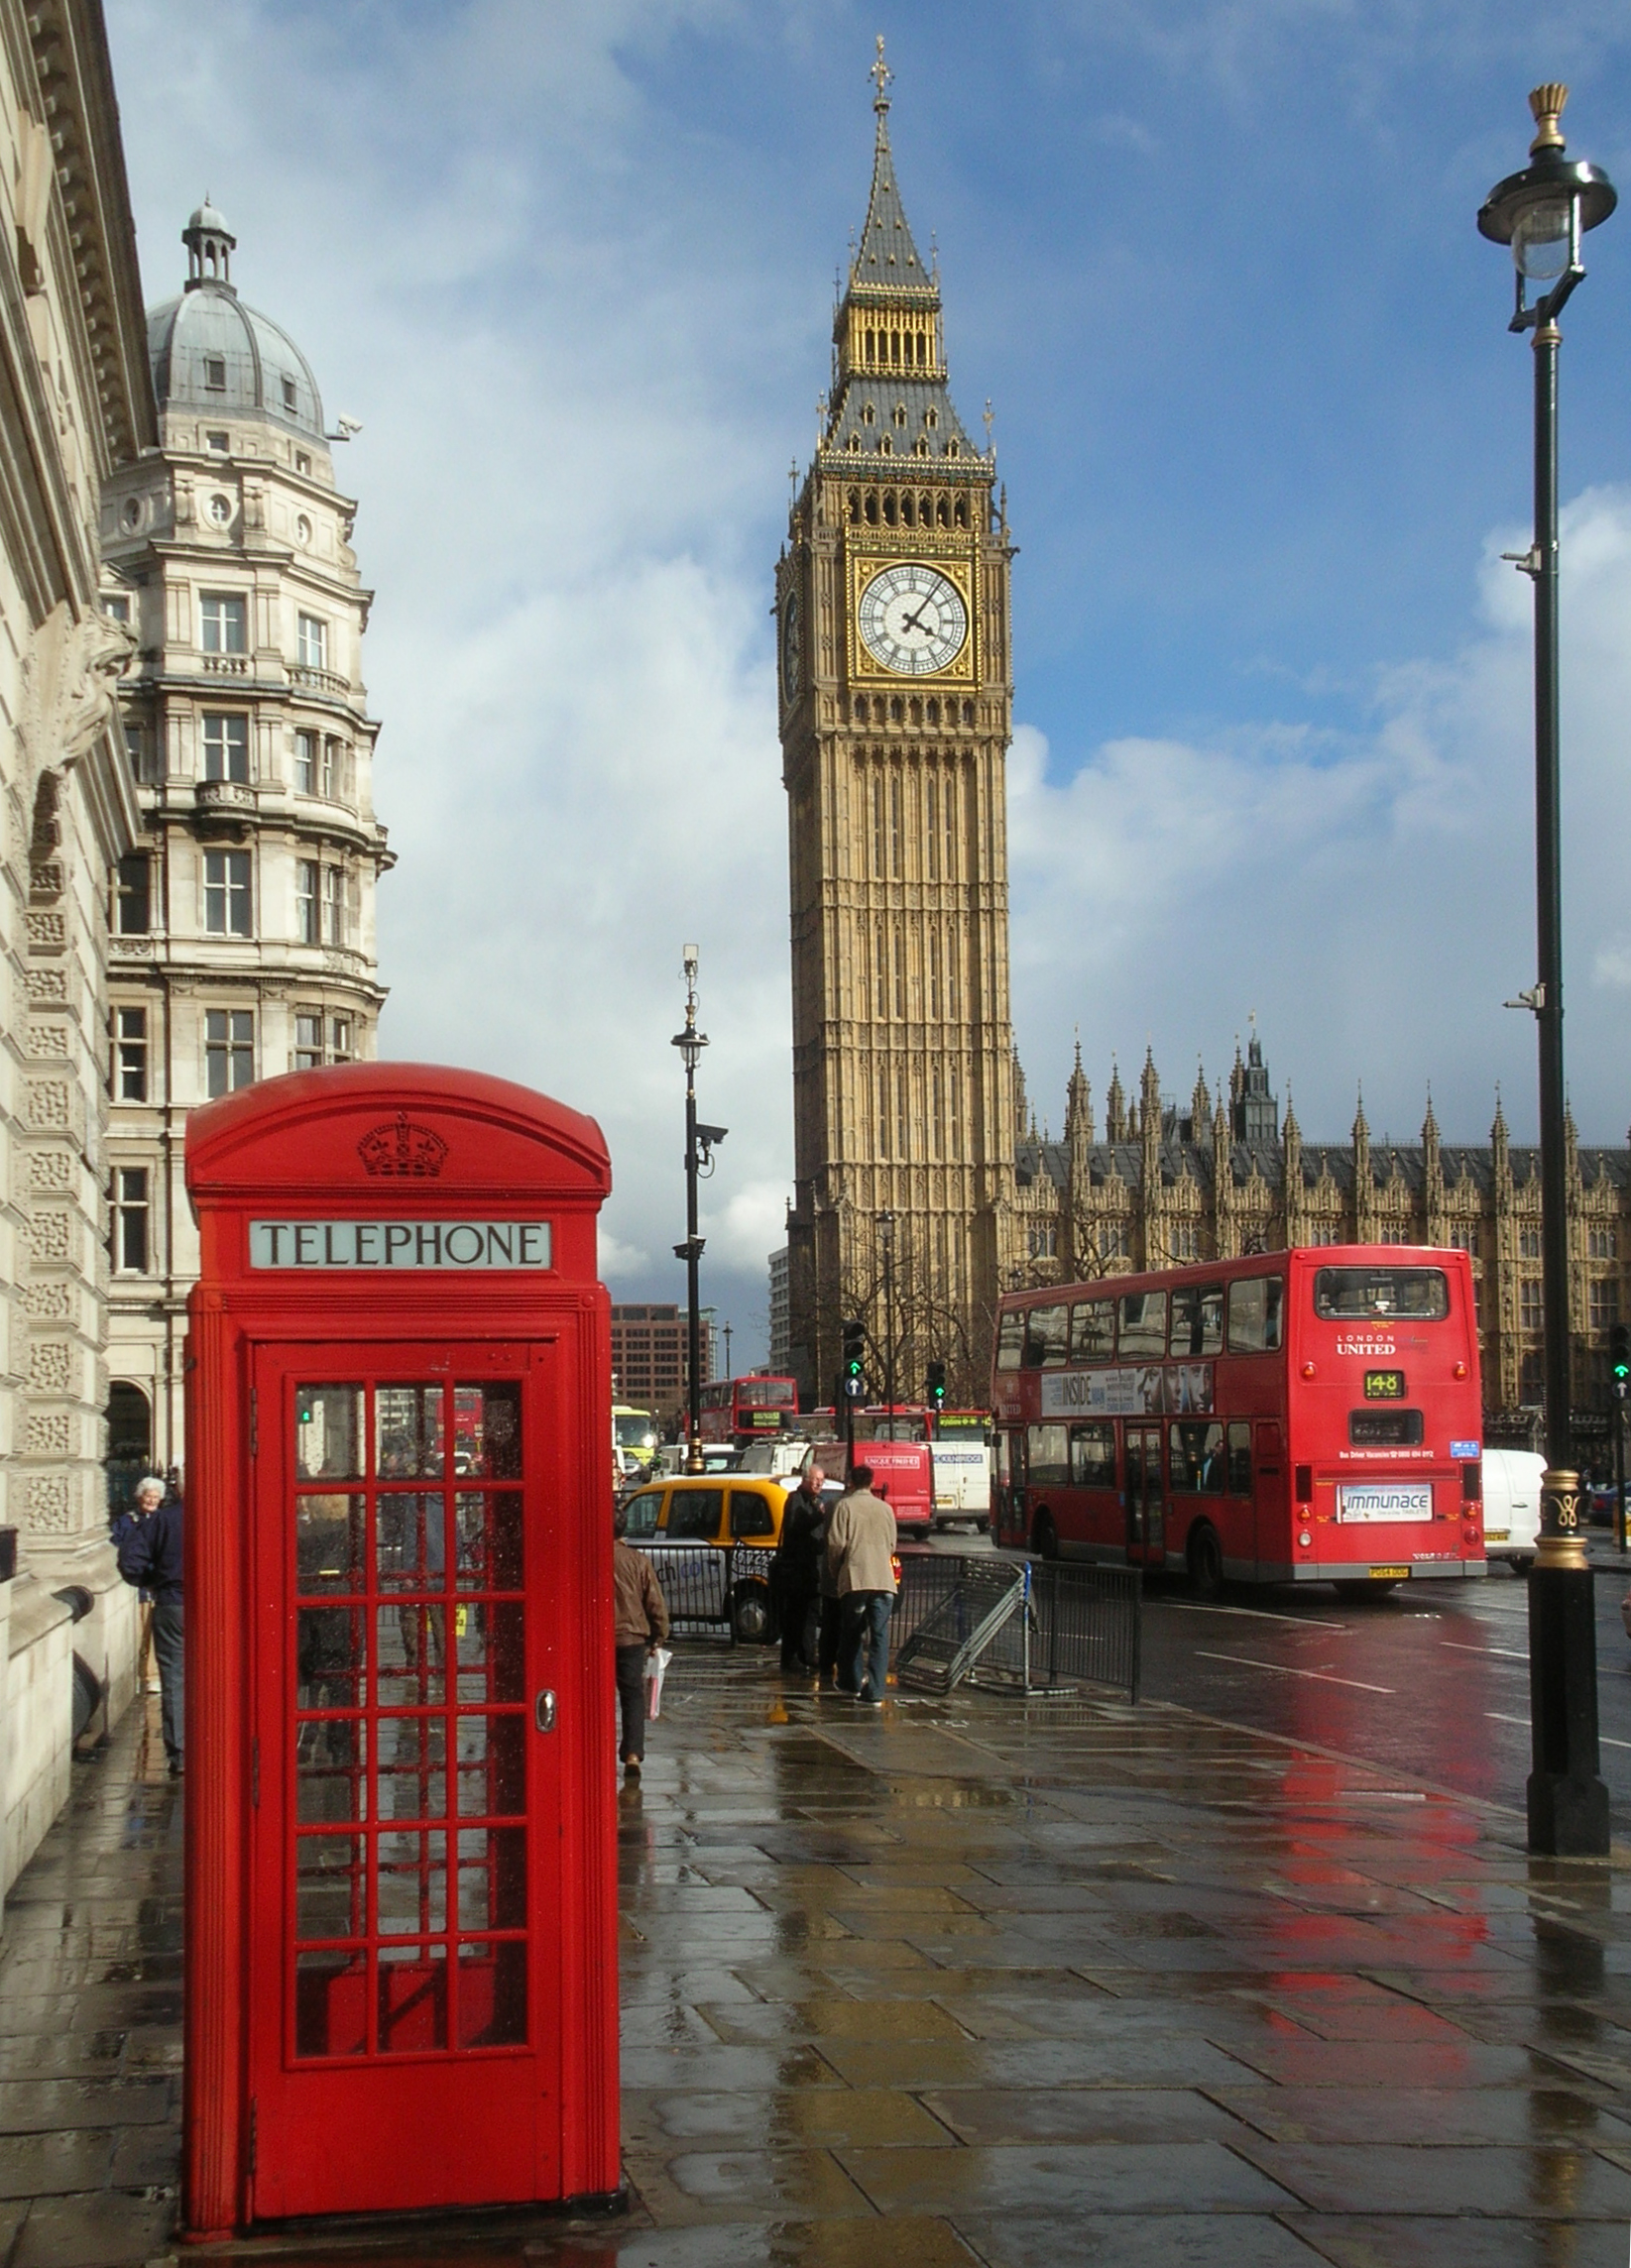 Londres no registra ningún fallecido por coronavirus en un día por primera vez en seis meses